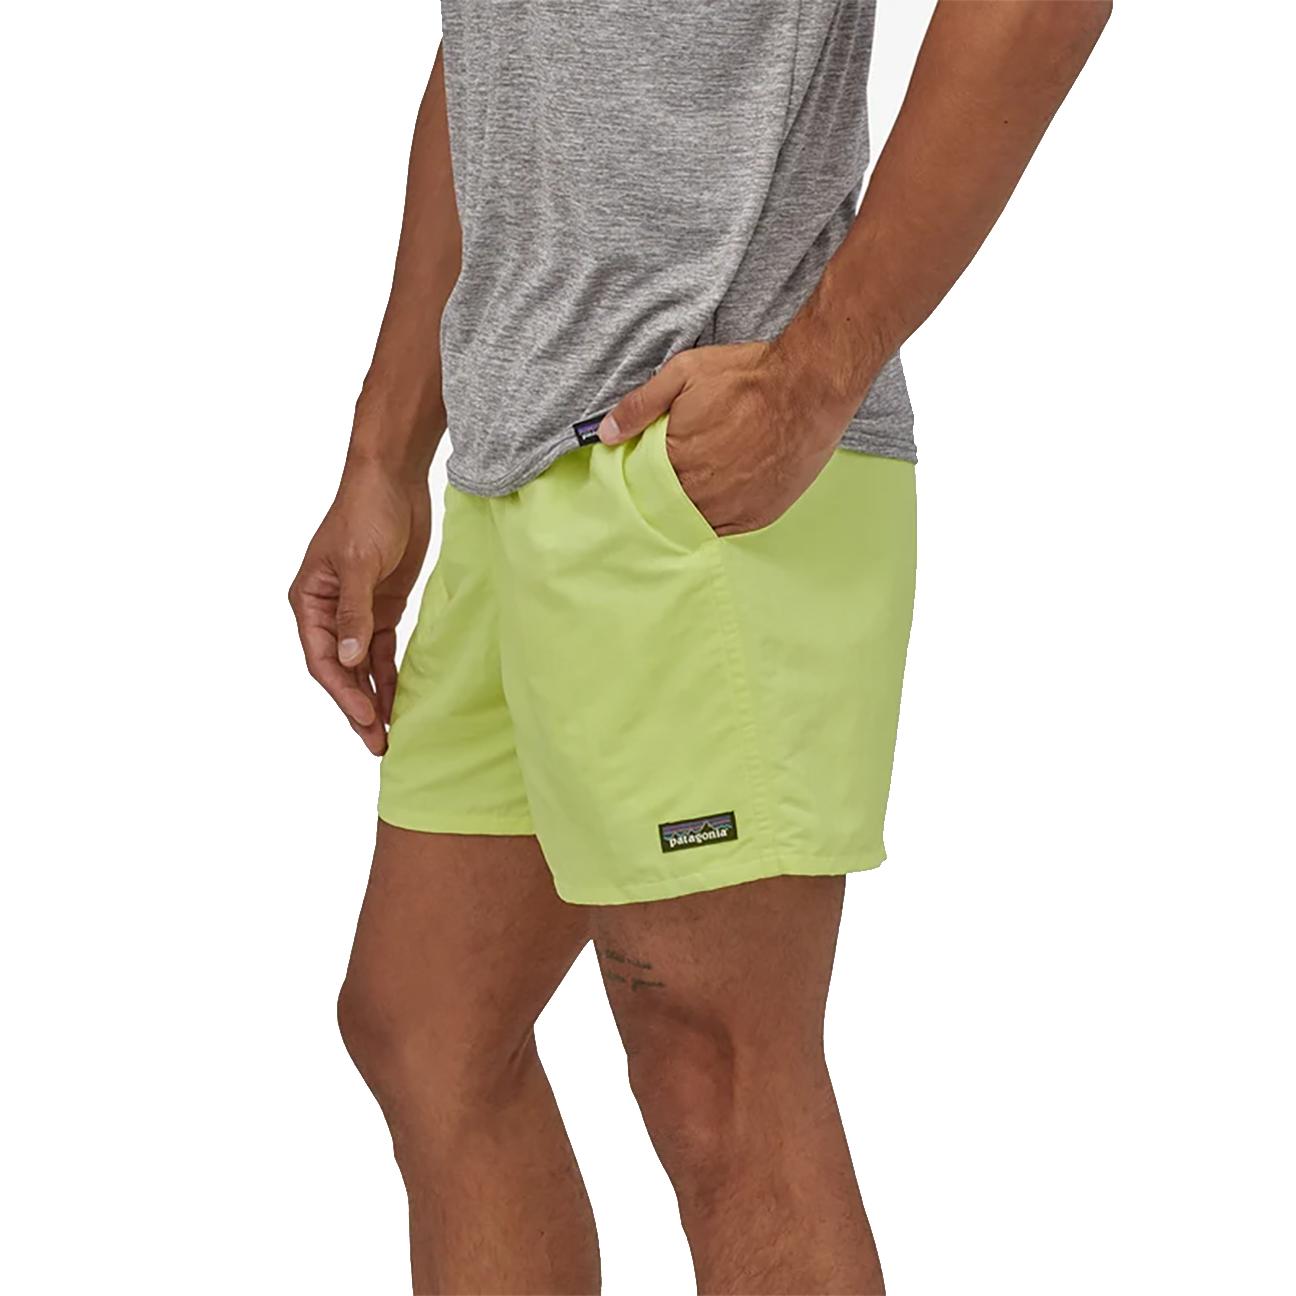 "Men's Baggies Shorts - 5"", Jellyfish Yellow-4"